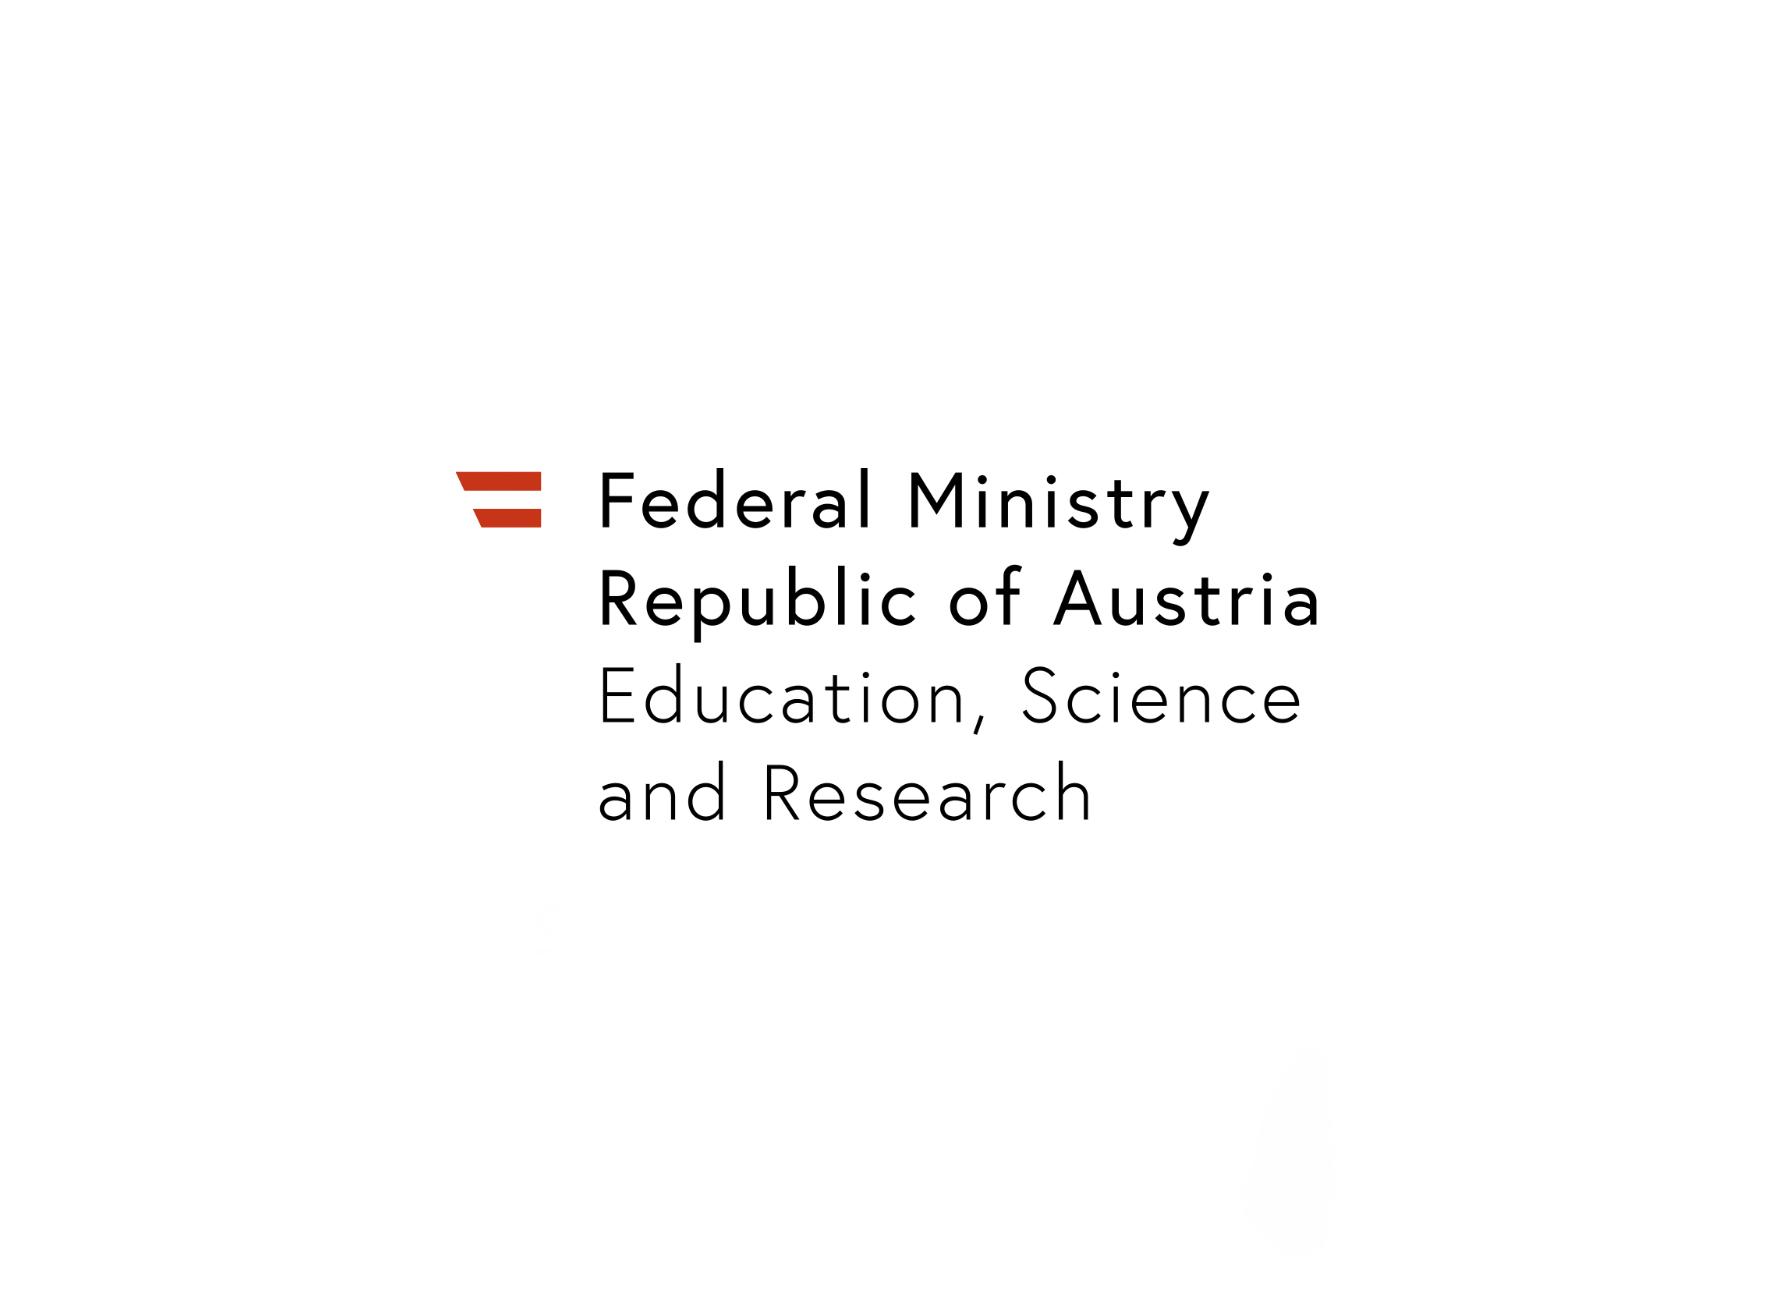 Dunavska nagrada za mlade naučnike 2021